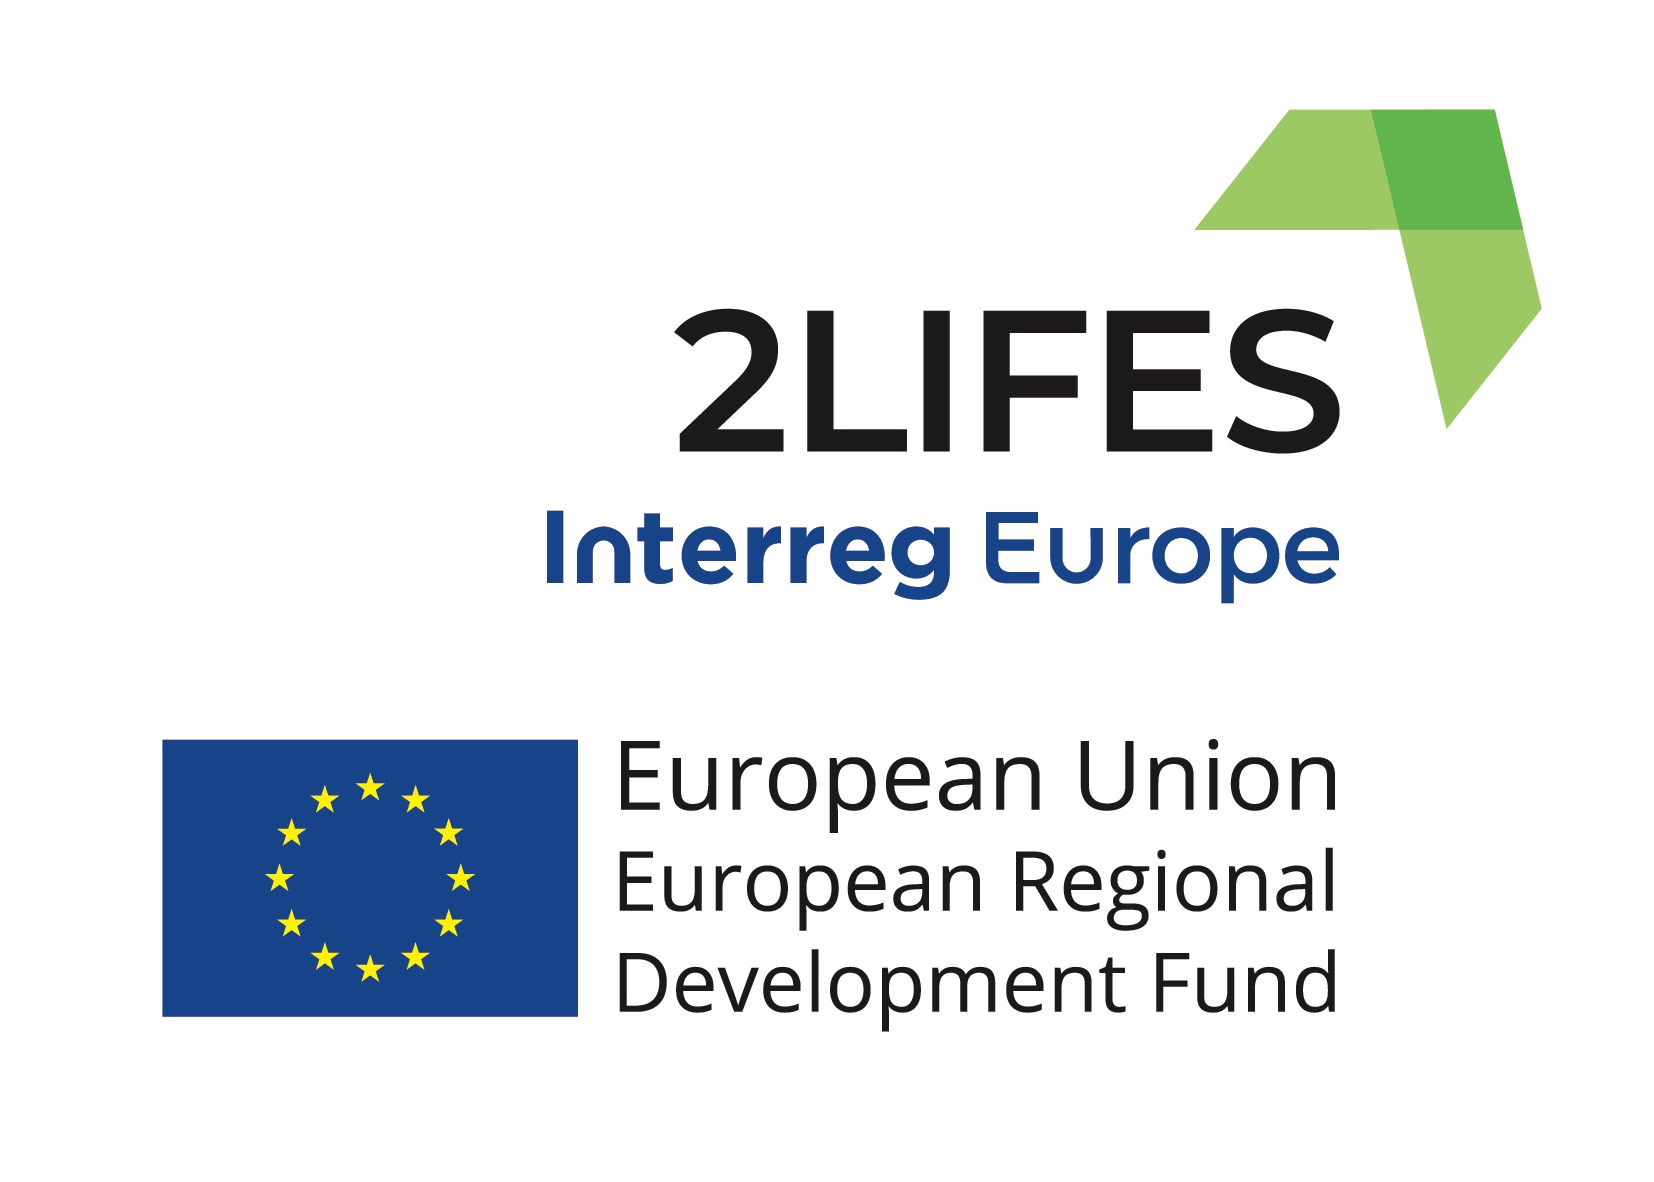 2lifes_logo.jpg